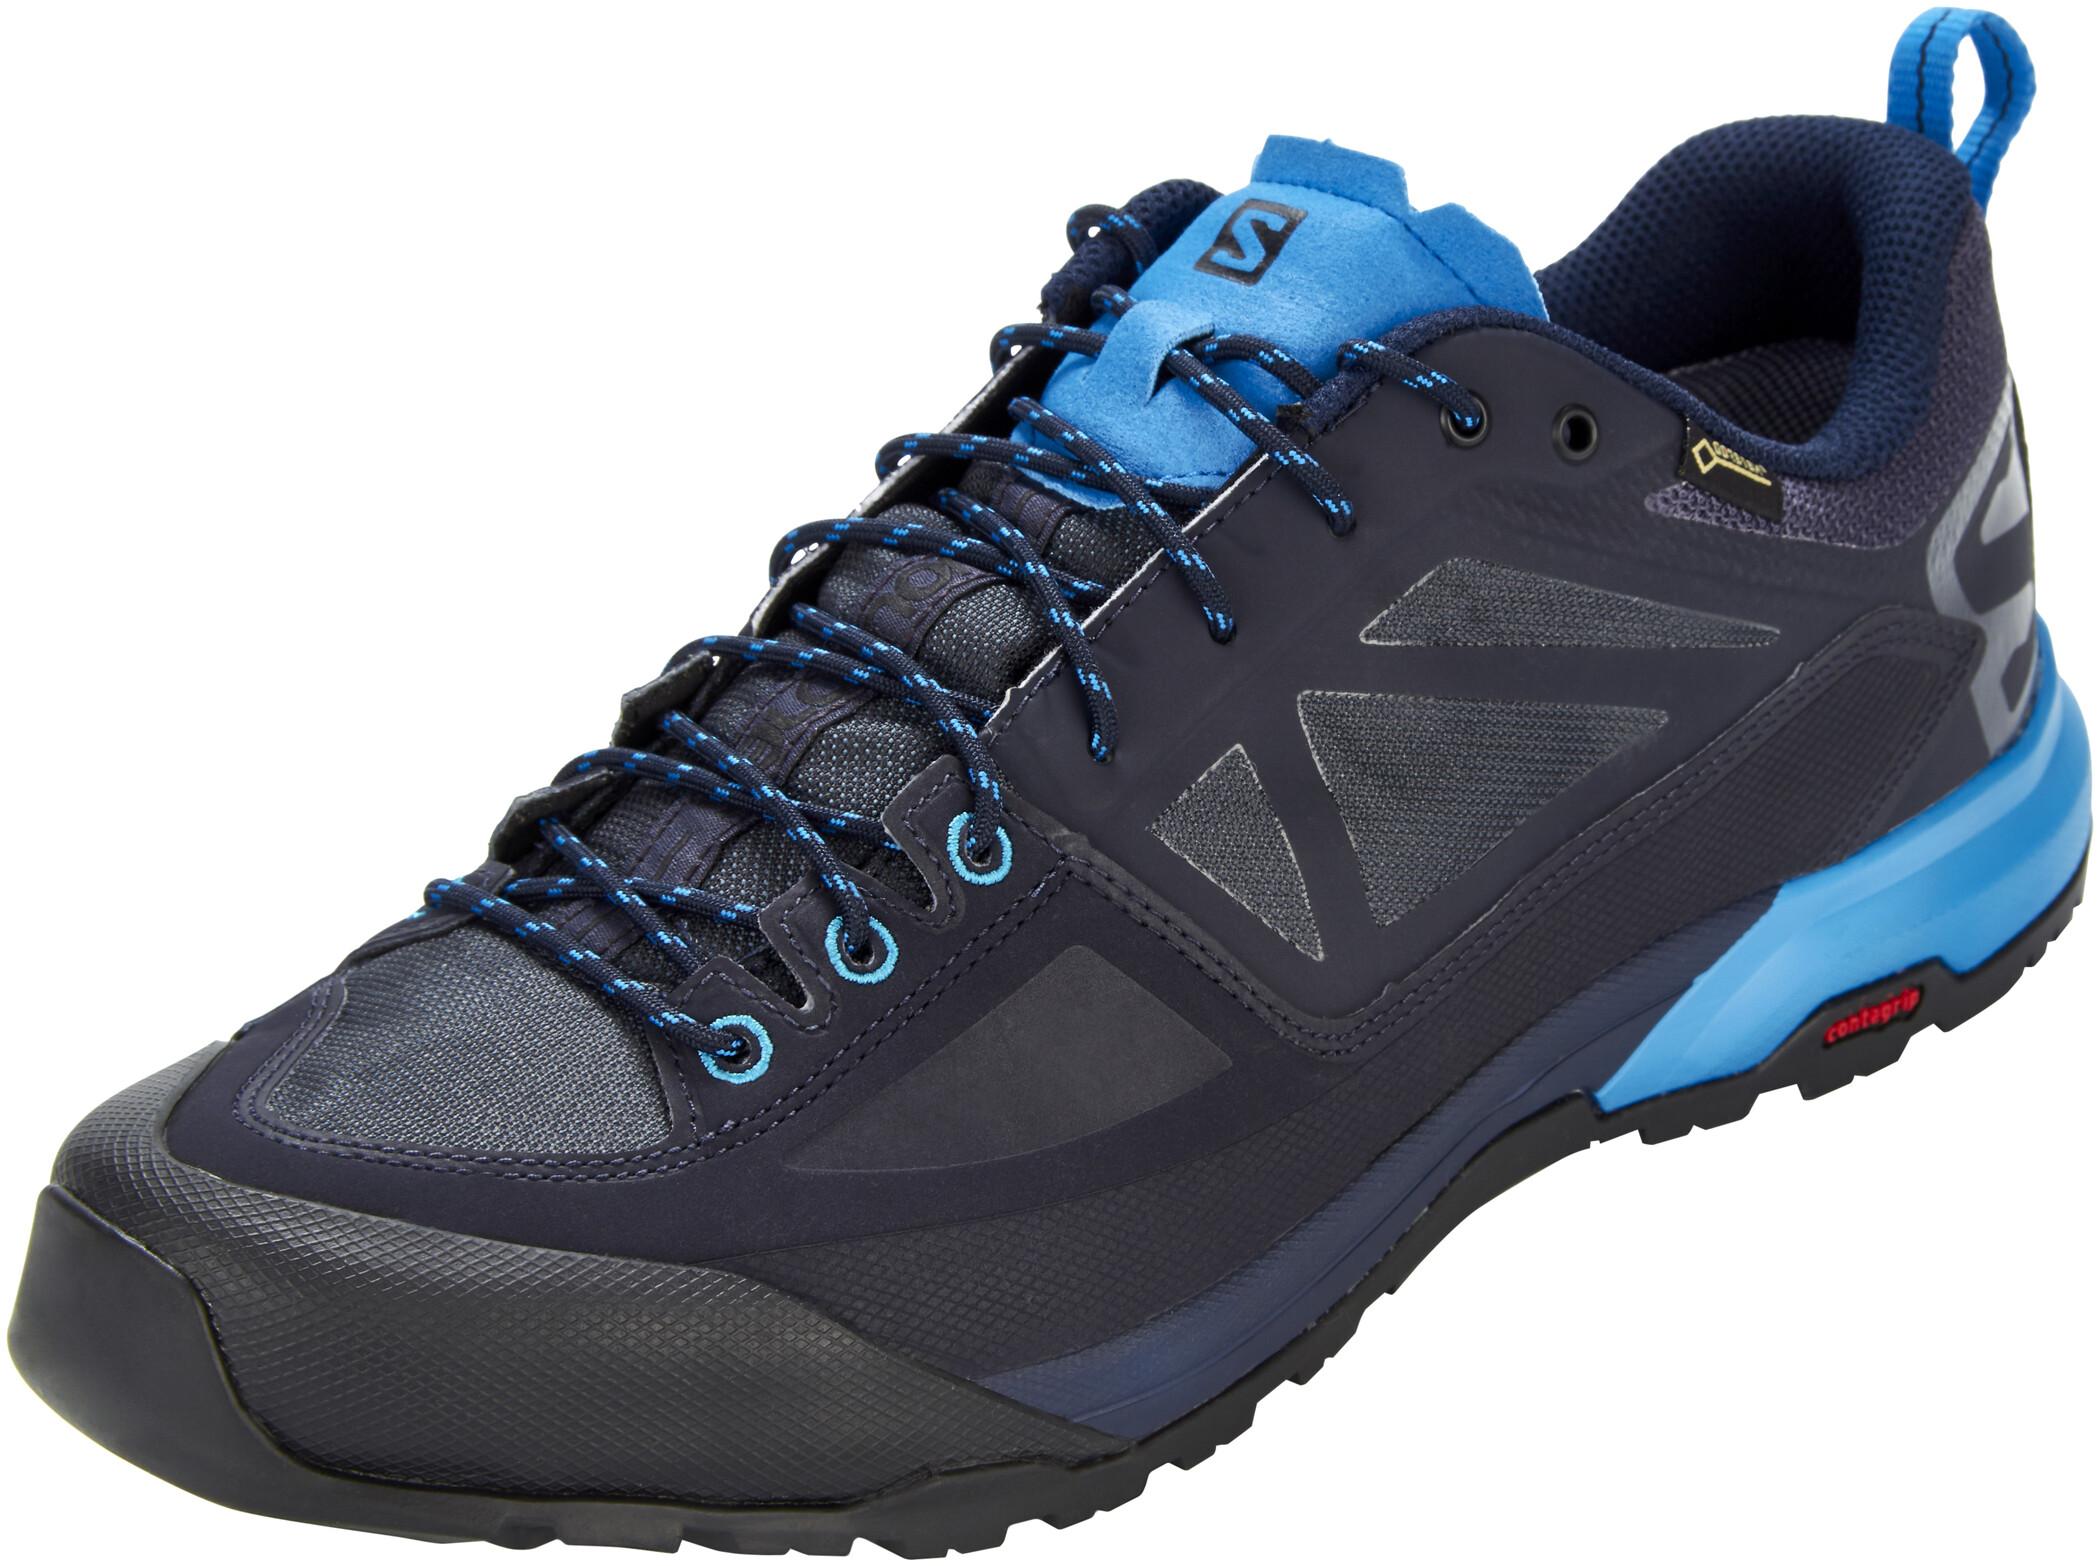 Salomon x Alp Spry Herren Zustiegsschuhe Mountain Shoes Wander Schuhe Trekking